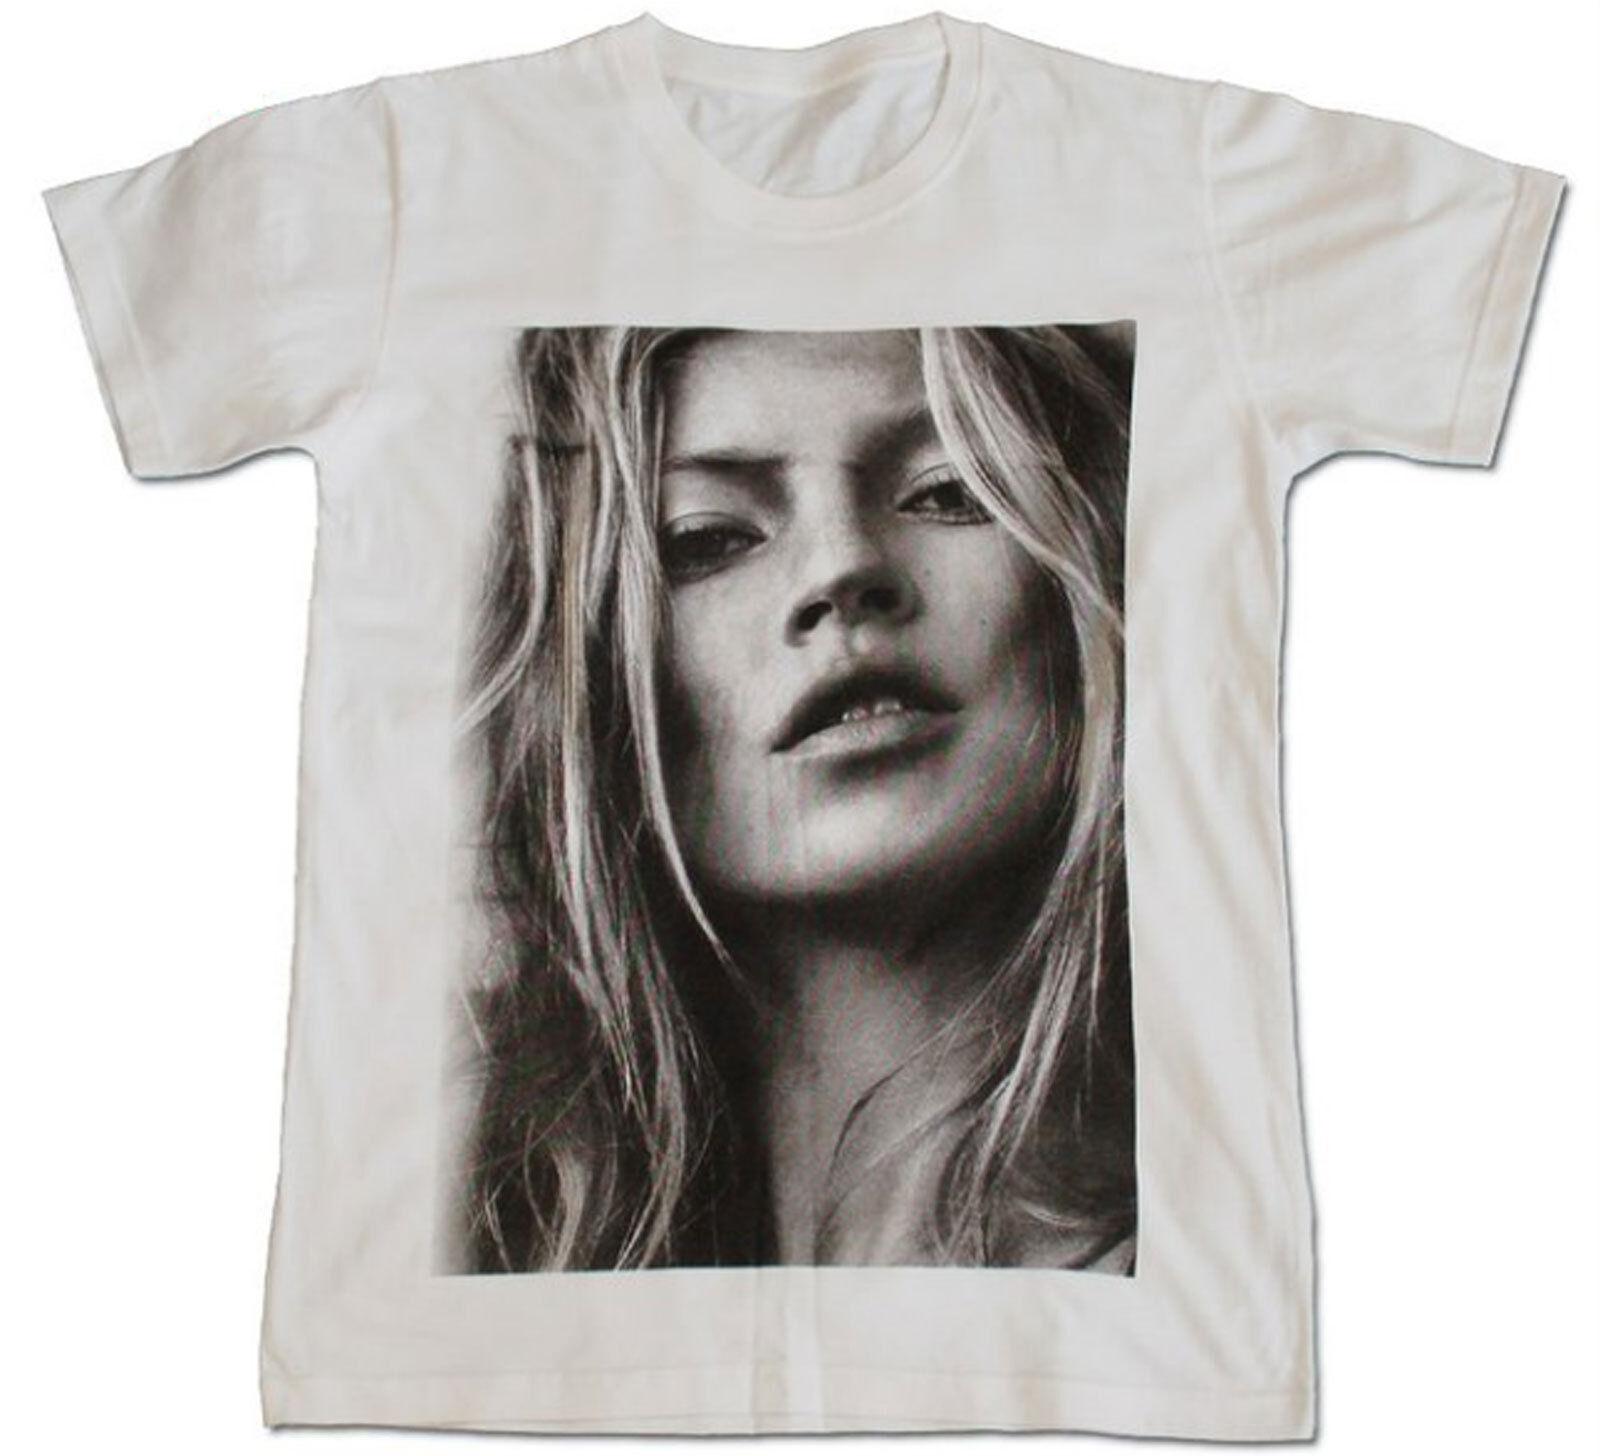 Kate Moss Sexy Model Men Printed T Shirt Punk Rock Shirts White Tees